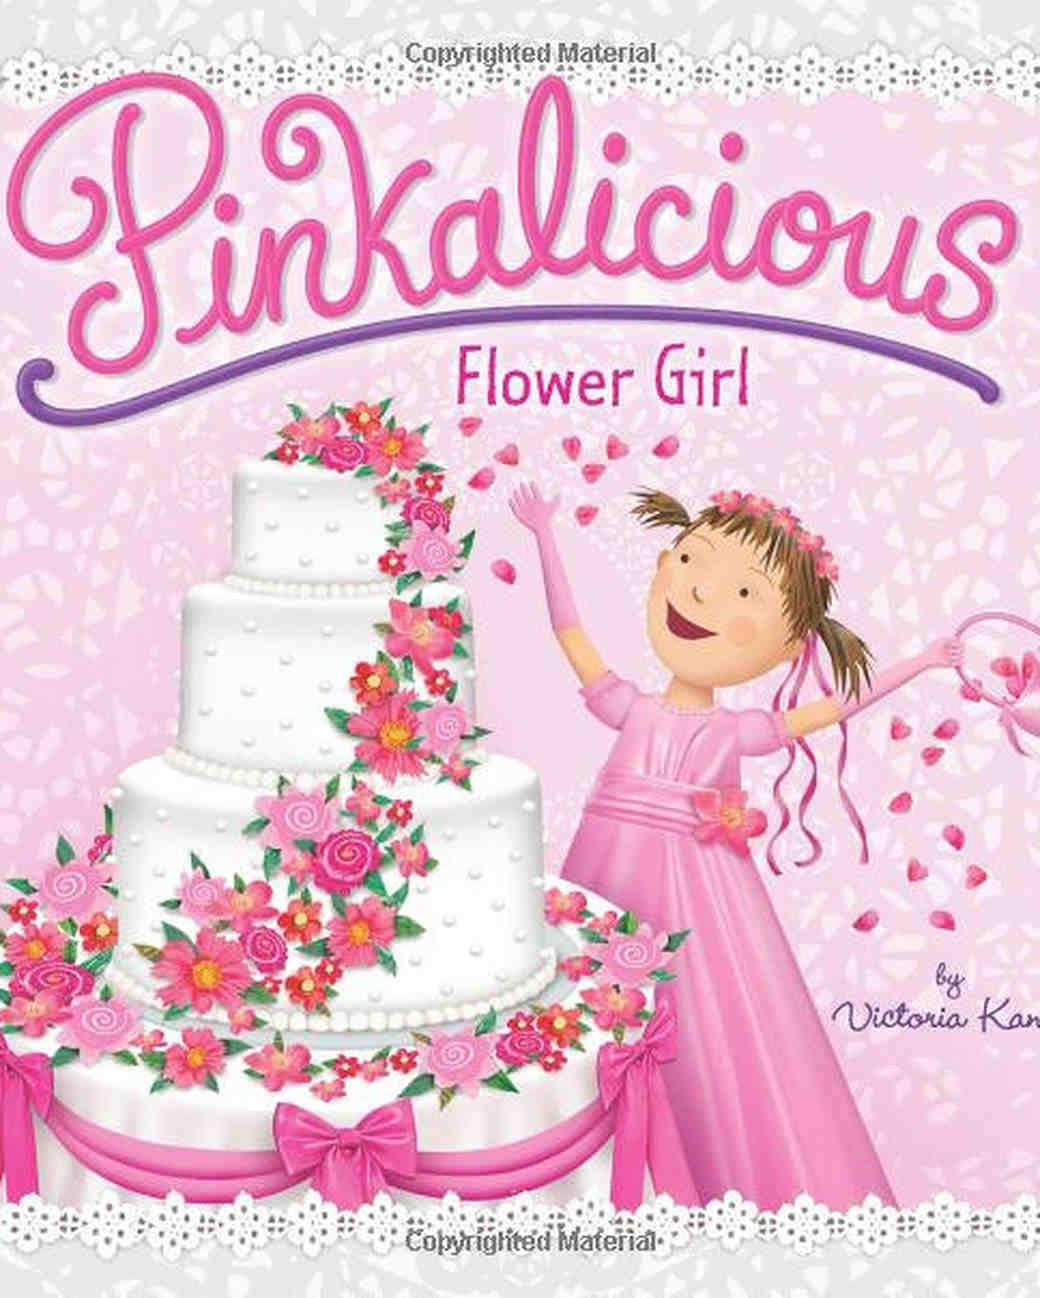 flower-girl-gift-pinkalicious-book-0616.jpg